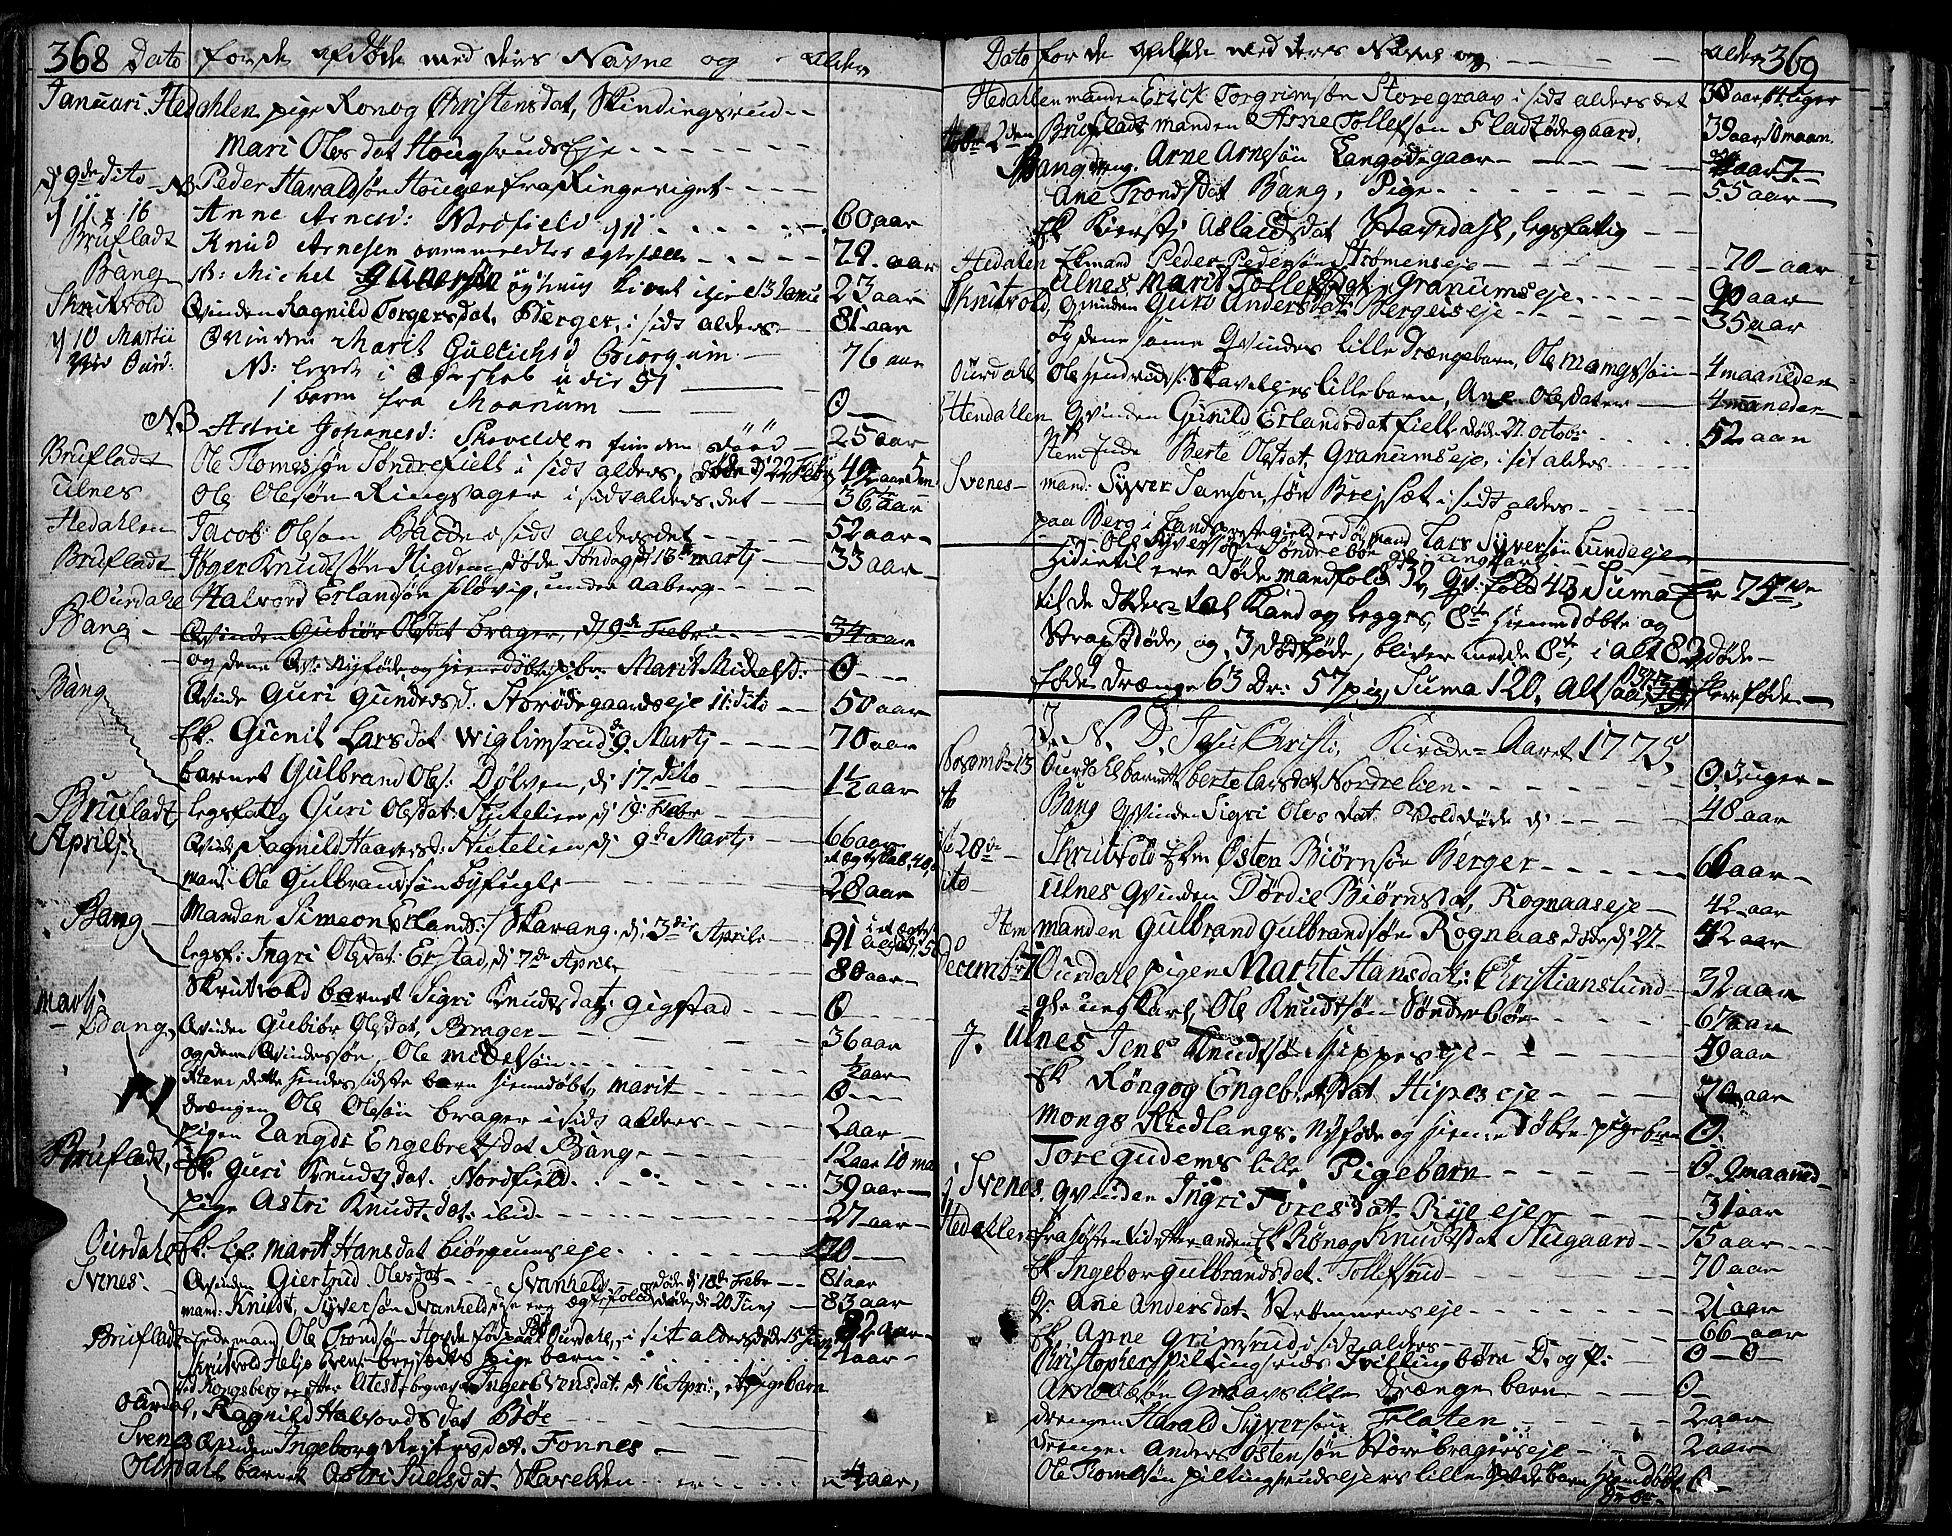 SAH, Aurdal prestekontor, Ministerialbok nr. 5, 1763-1781, s. 368-369